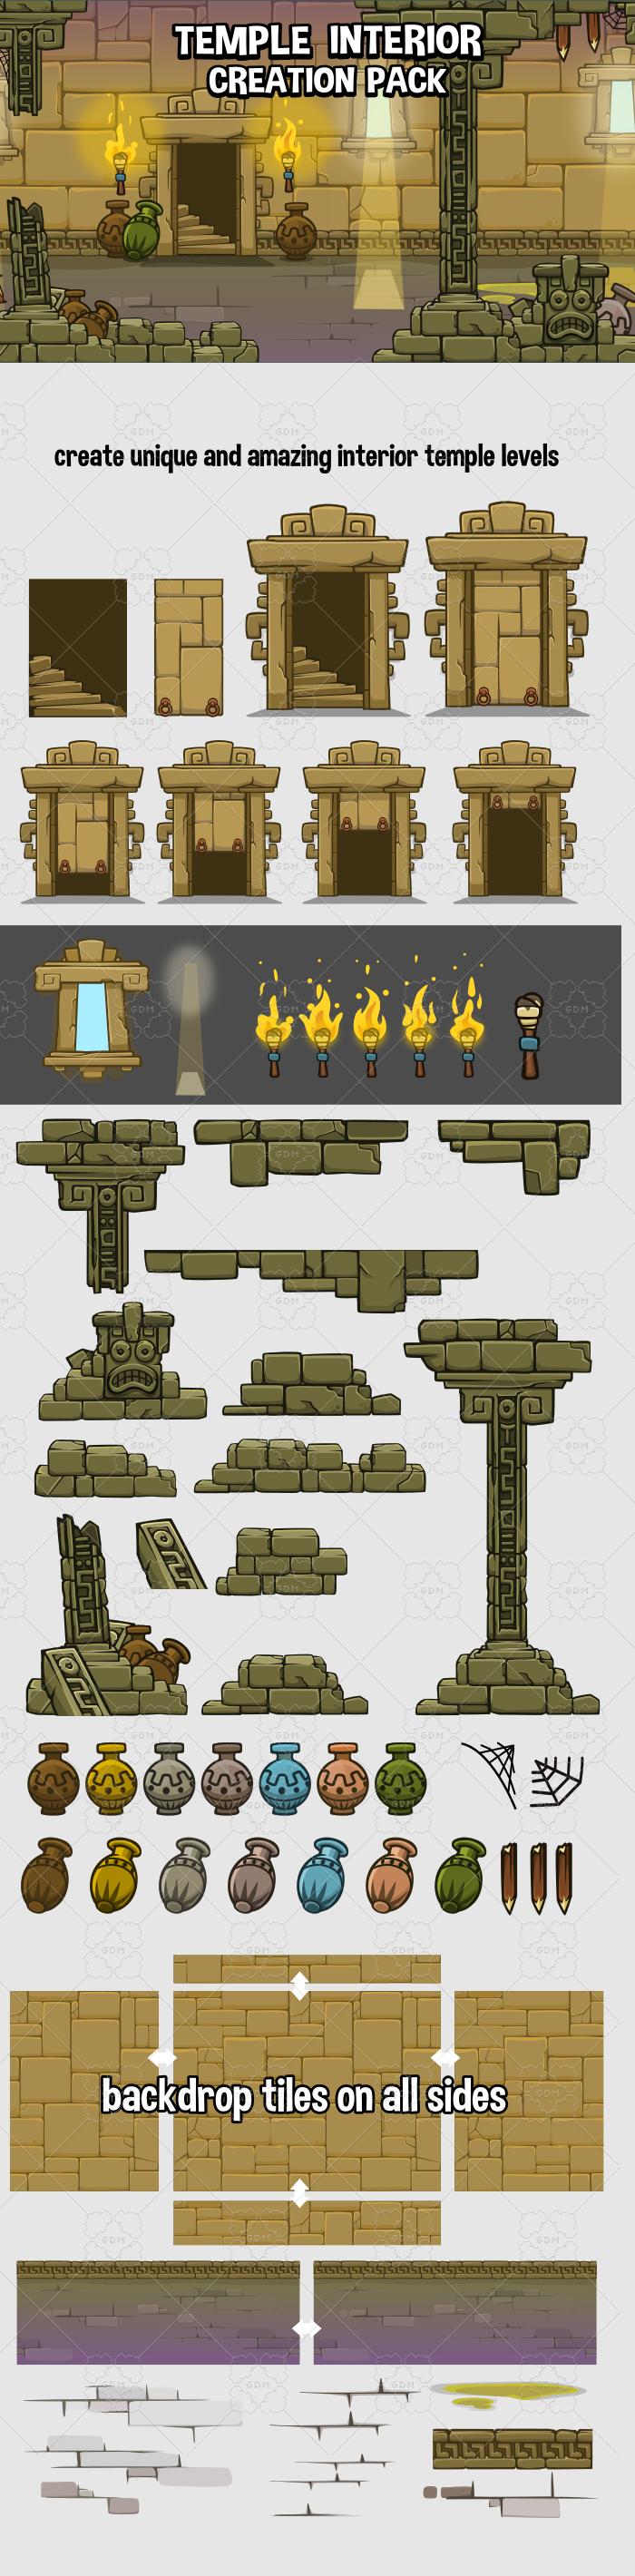 2d temple level interior game asset construction kit